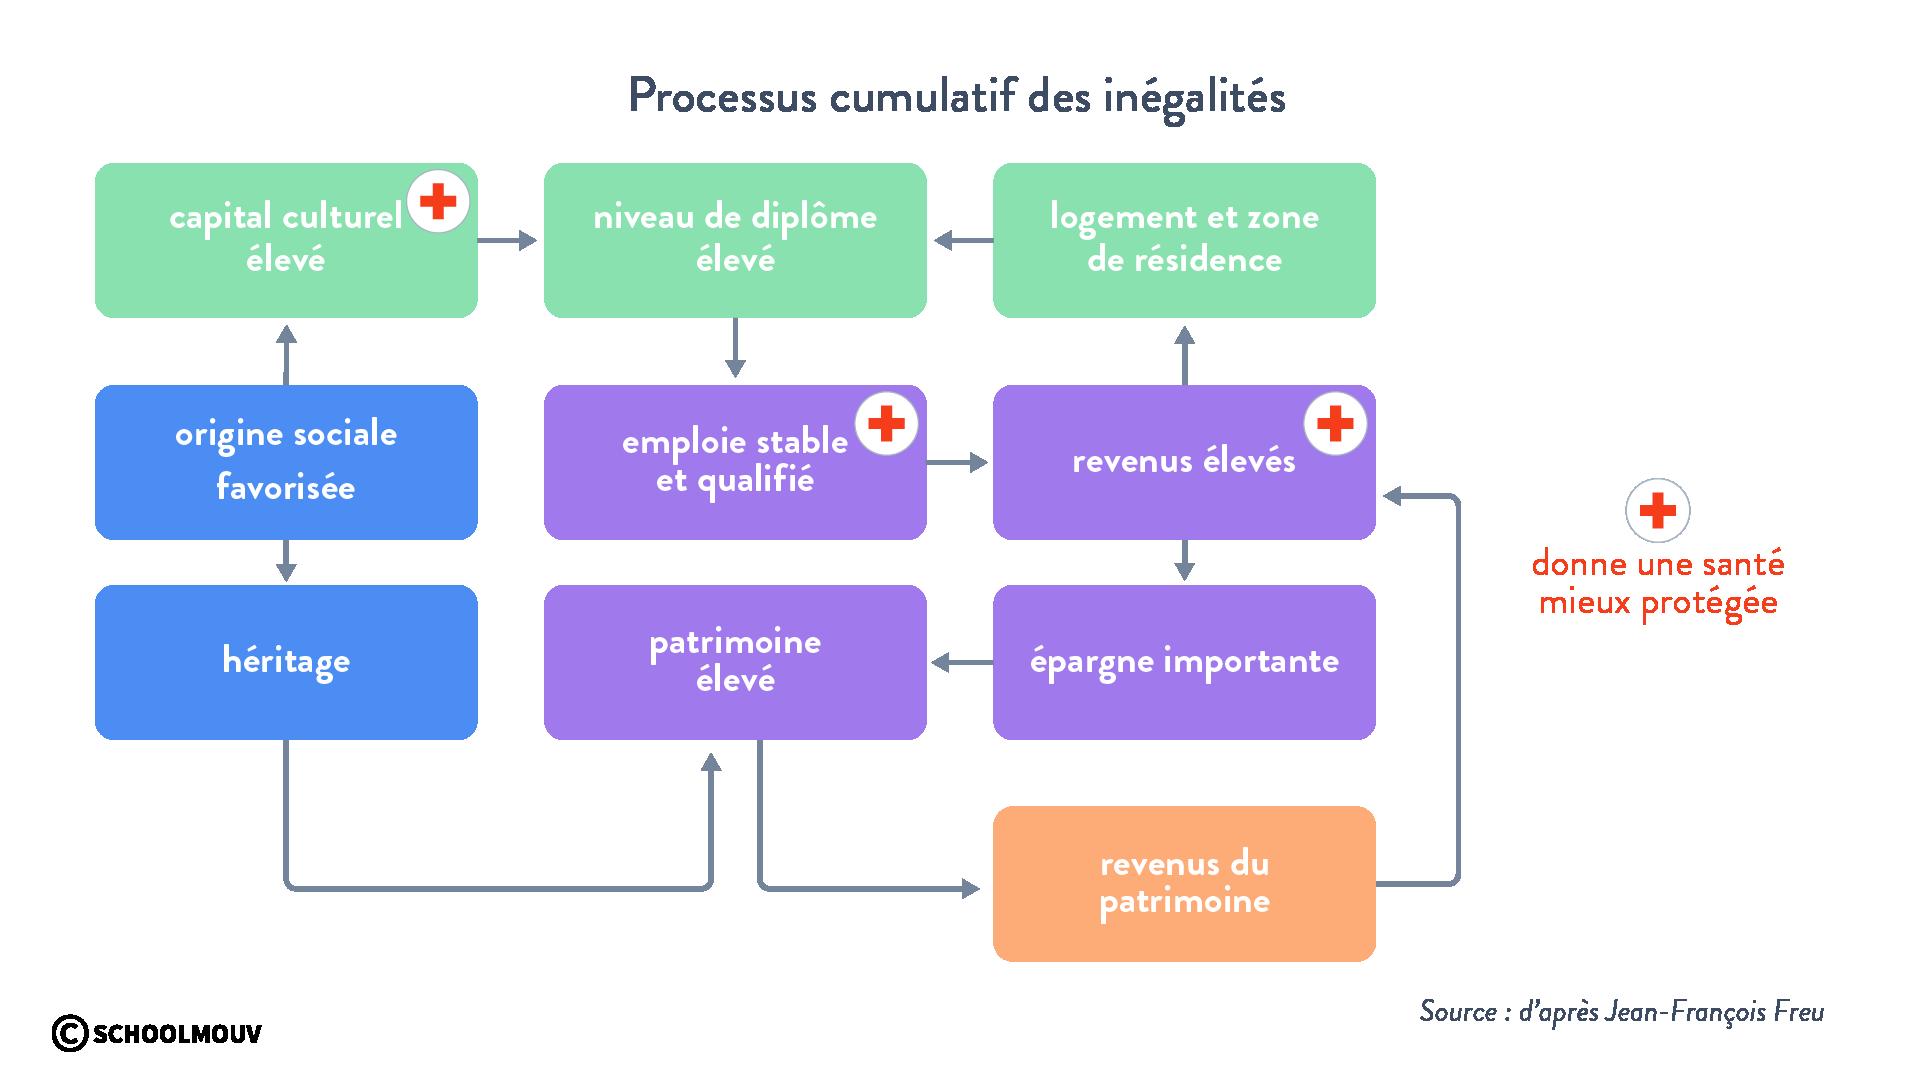 processus cumulatif inégalités